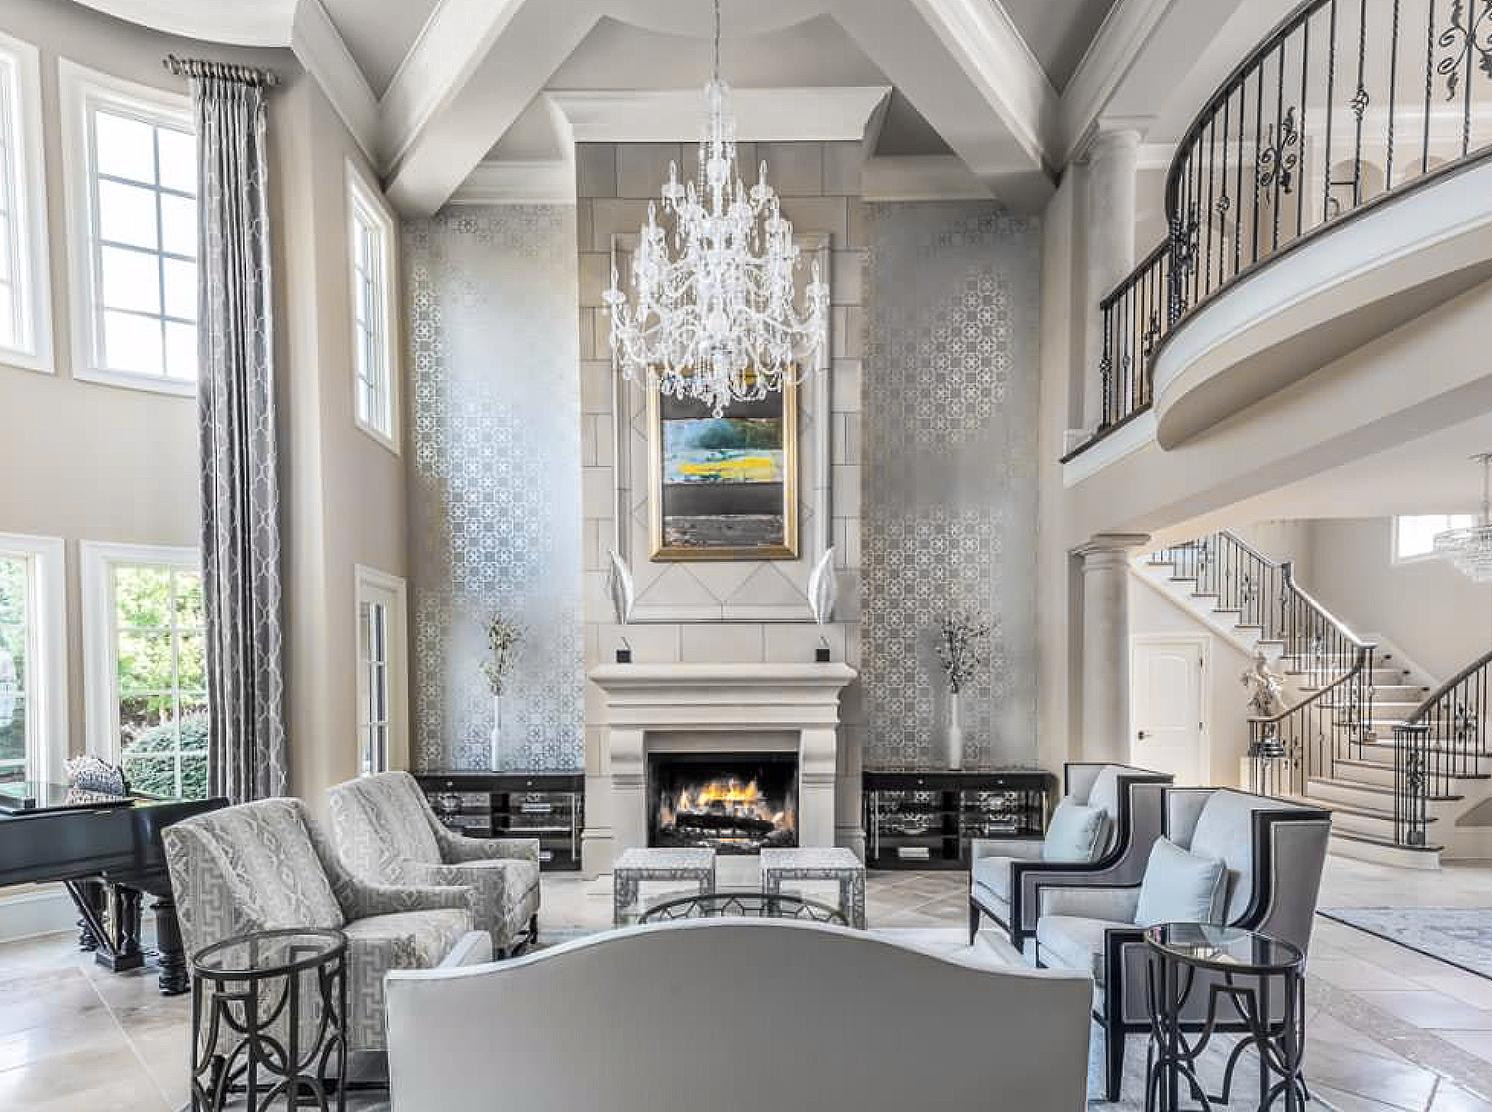 Elegant Grey And Beige Mediterranean Style Living Room Decor